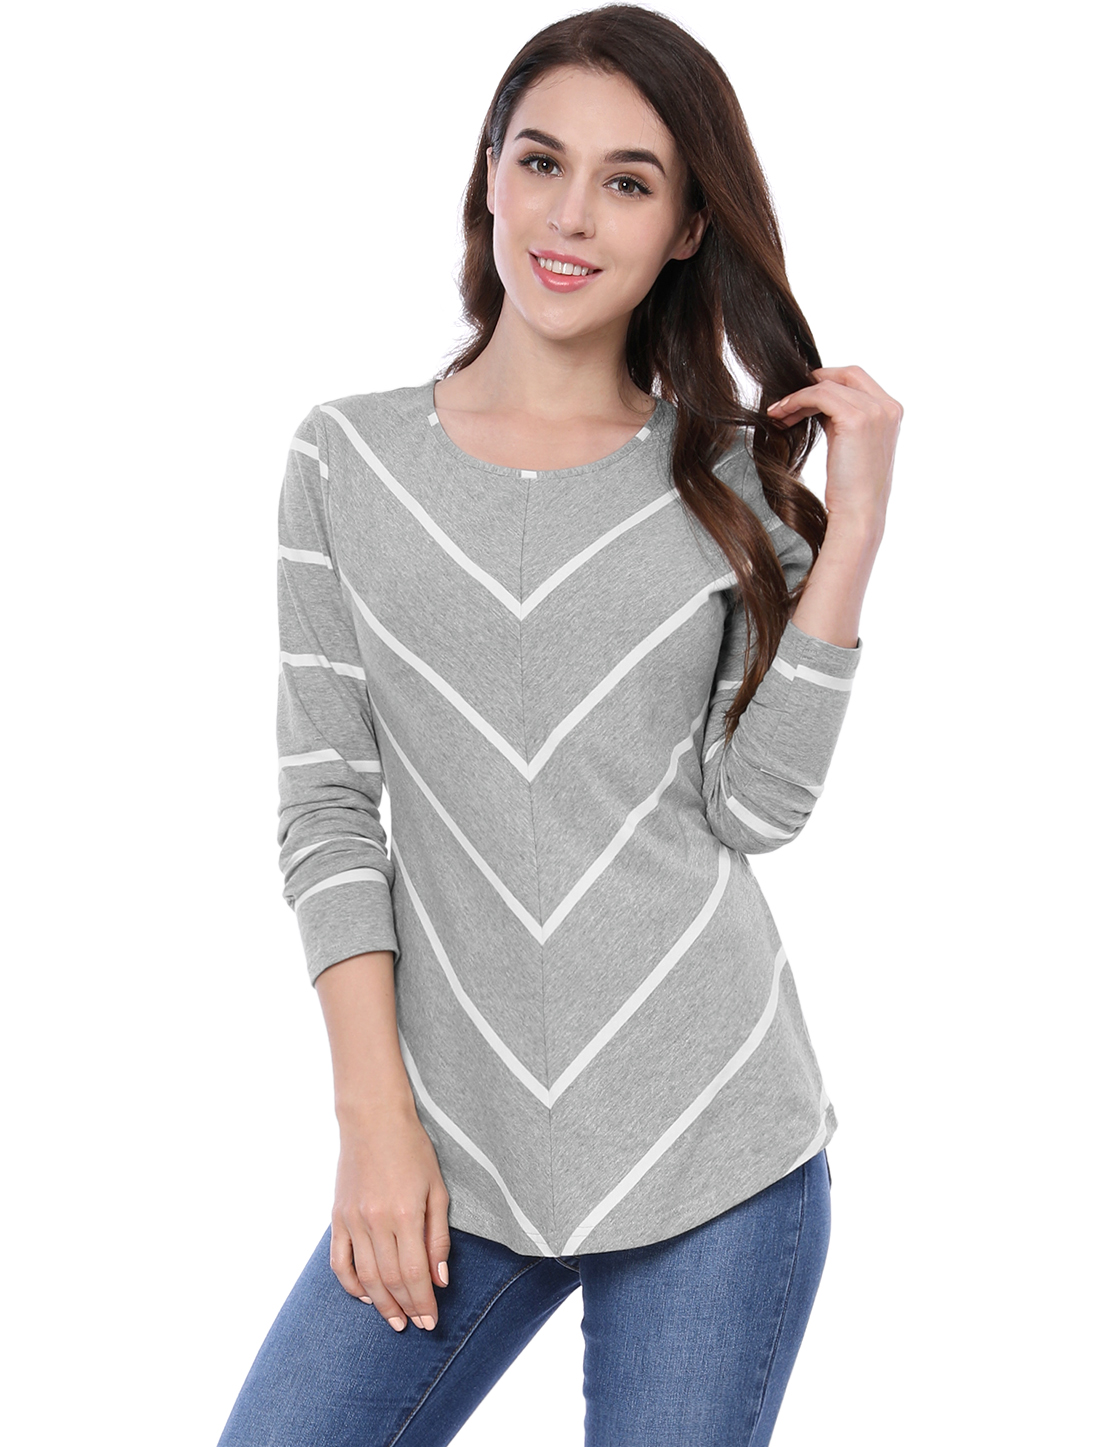 Women Long Sleeves Scoop Neck Striped Chevron Print Top Gray S